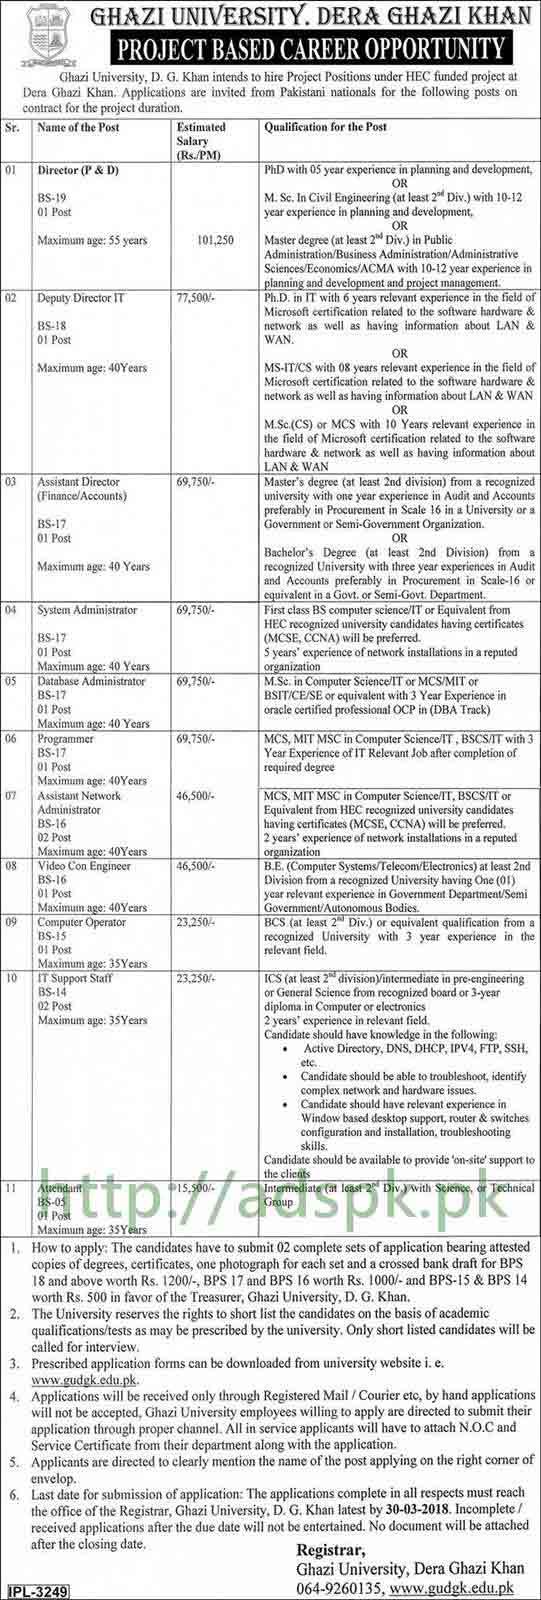 Ghazi University Dera Ghazi Khan Jobs 2018 Director P&D Deputy Director IT Assistant Director System Admin Database Admin Programmer Jobs Application Form Deadline 30-03-2018 Apply Now